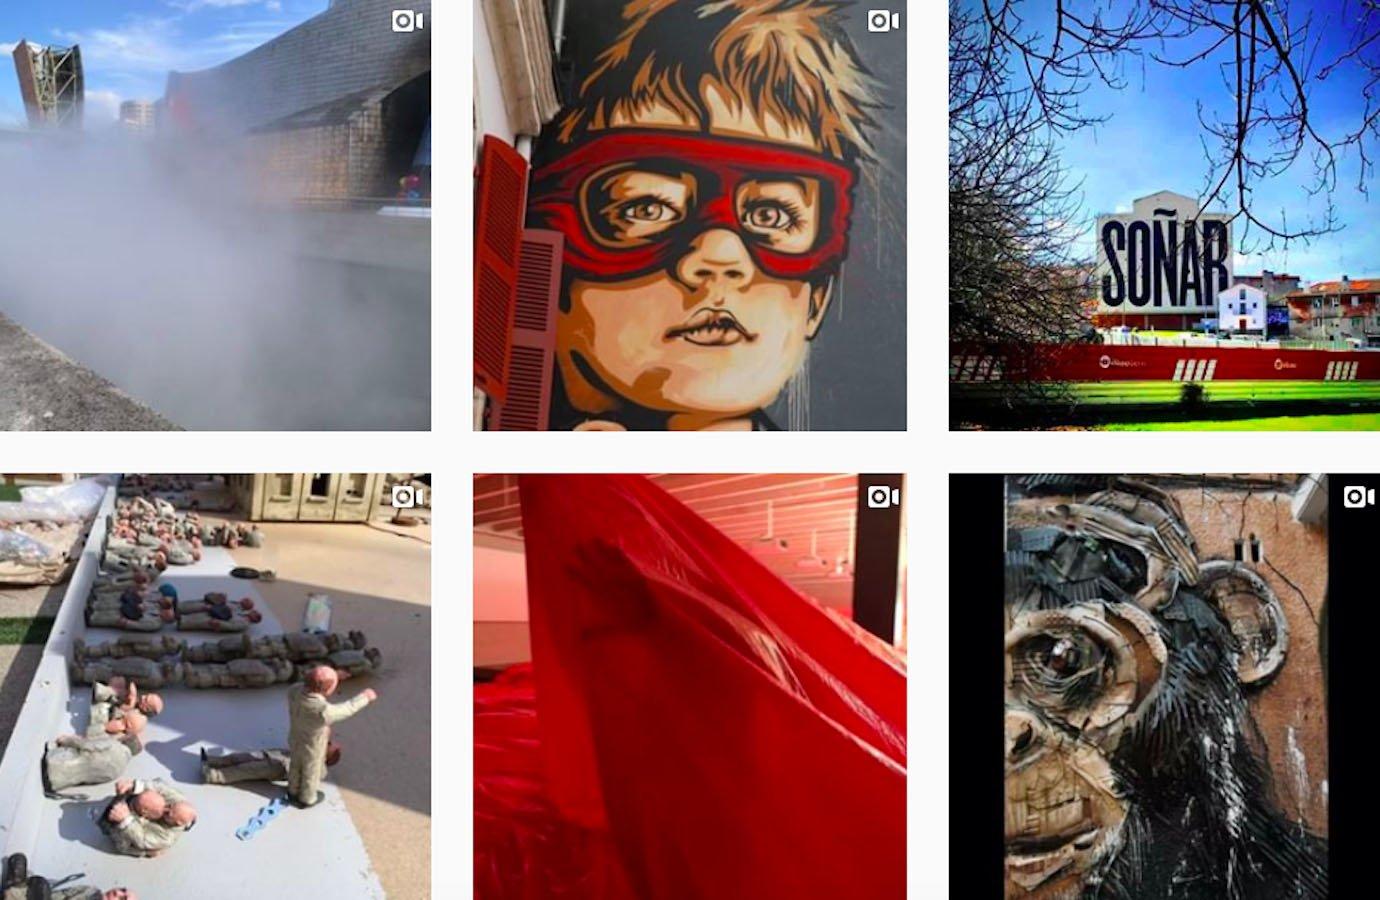 Web Design Inspiration: 110+ Accounts On Instagram and 10+ Best UX & Web Design Books in 2020 - bkstreetart